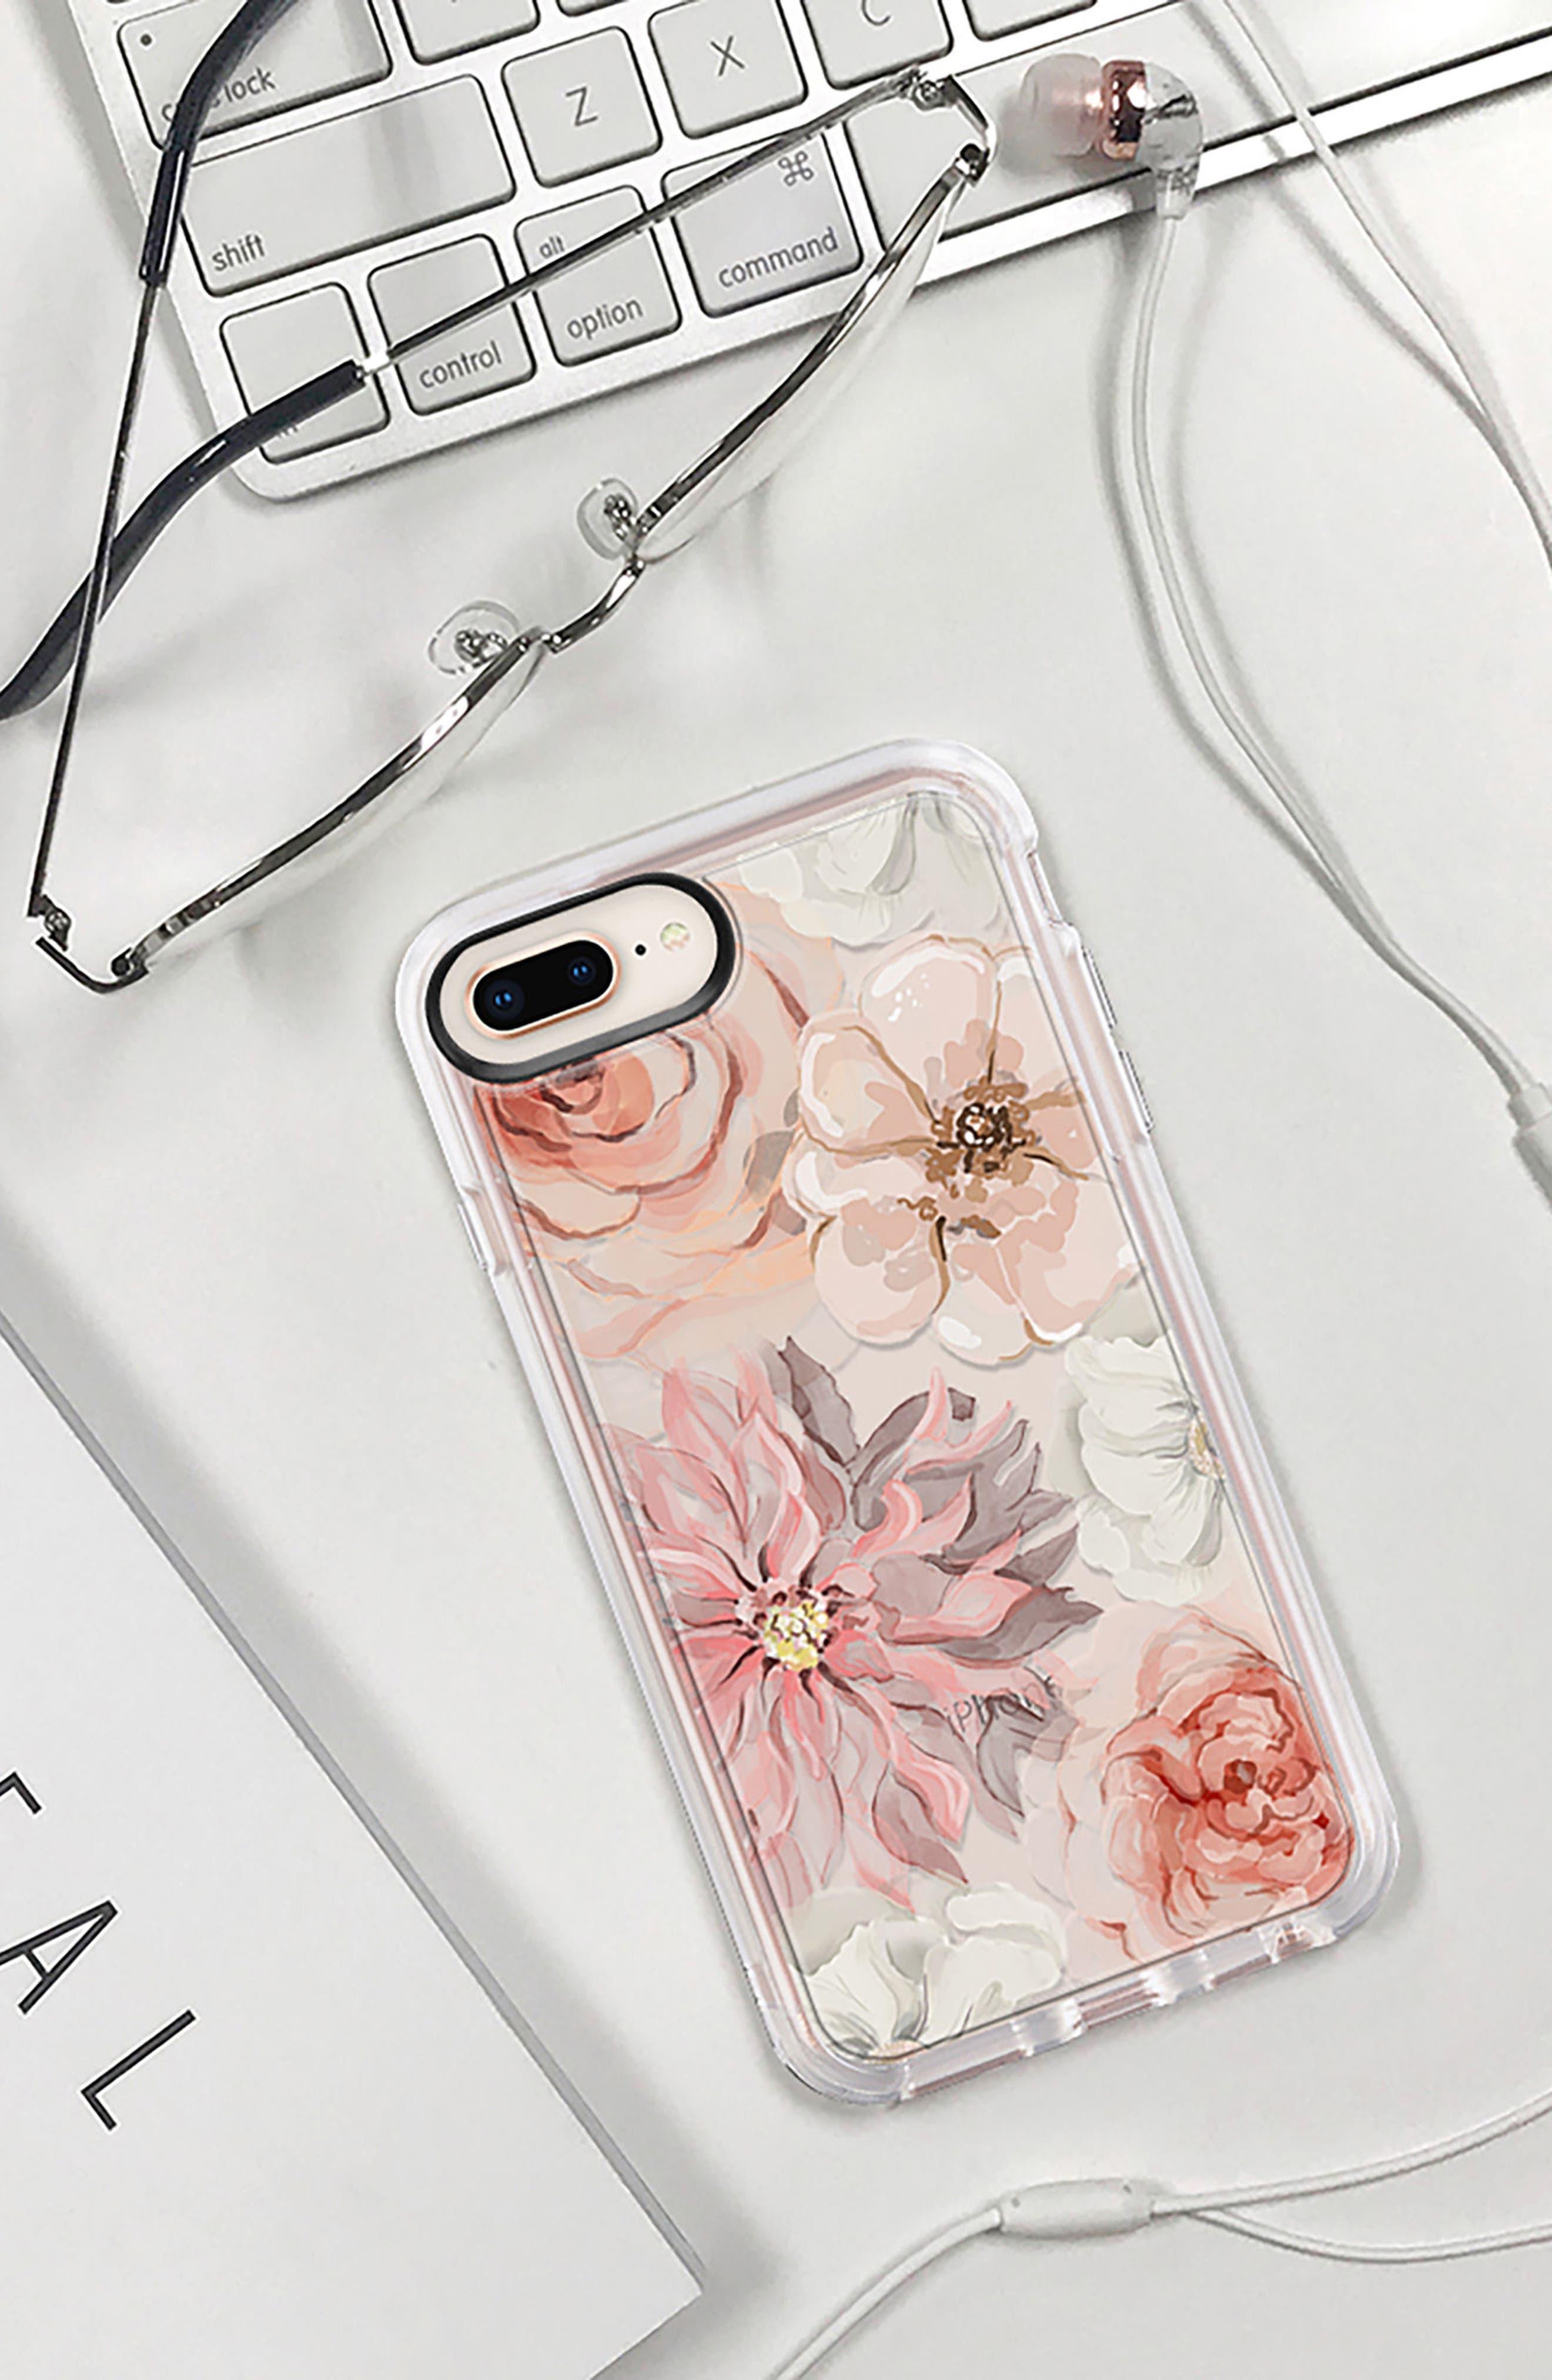 Pretty Blush iPhone 7/8 & 7/8 Plus Case,                             Alternate thumbnail 9, color,                             BLUSH PINK